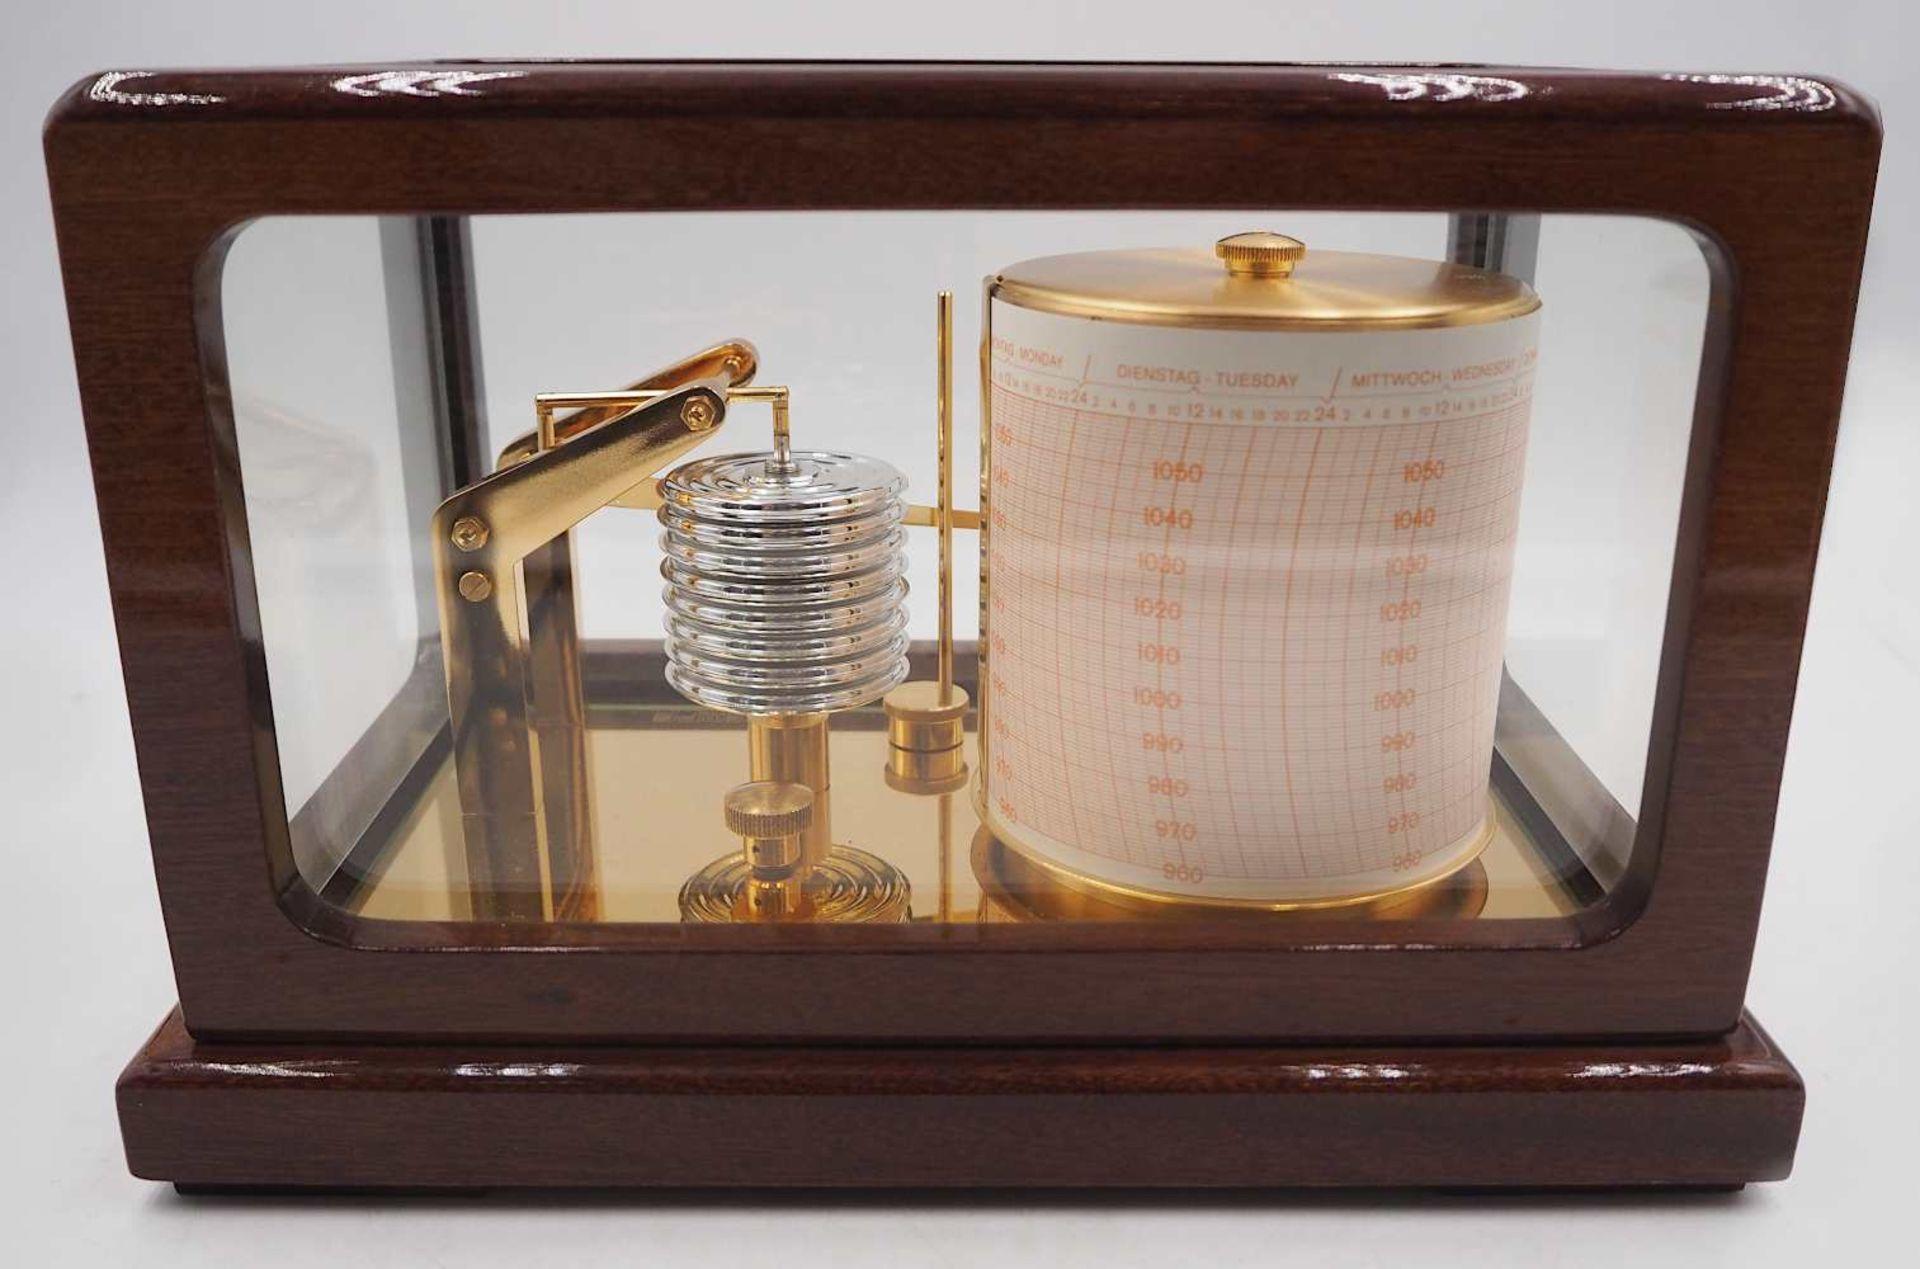 1 Trommelbarograph WEMPE CHRONOMETERWERKE GmbH, 20. Jh. wohl Mahagoni-Gehäuse allseit - Bild 6 aus 6